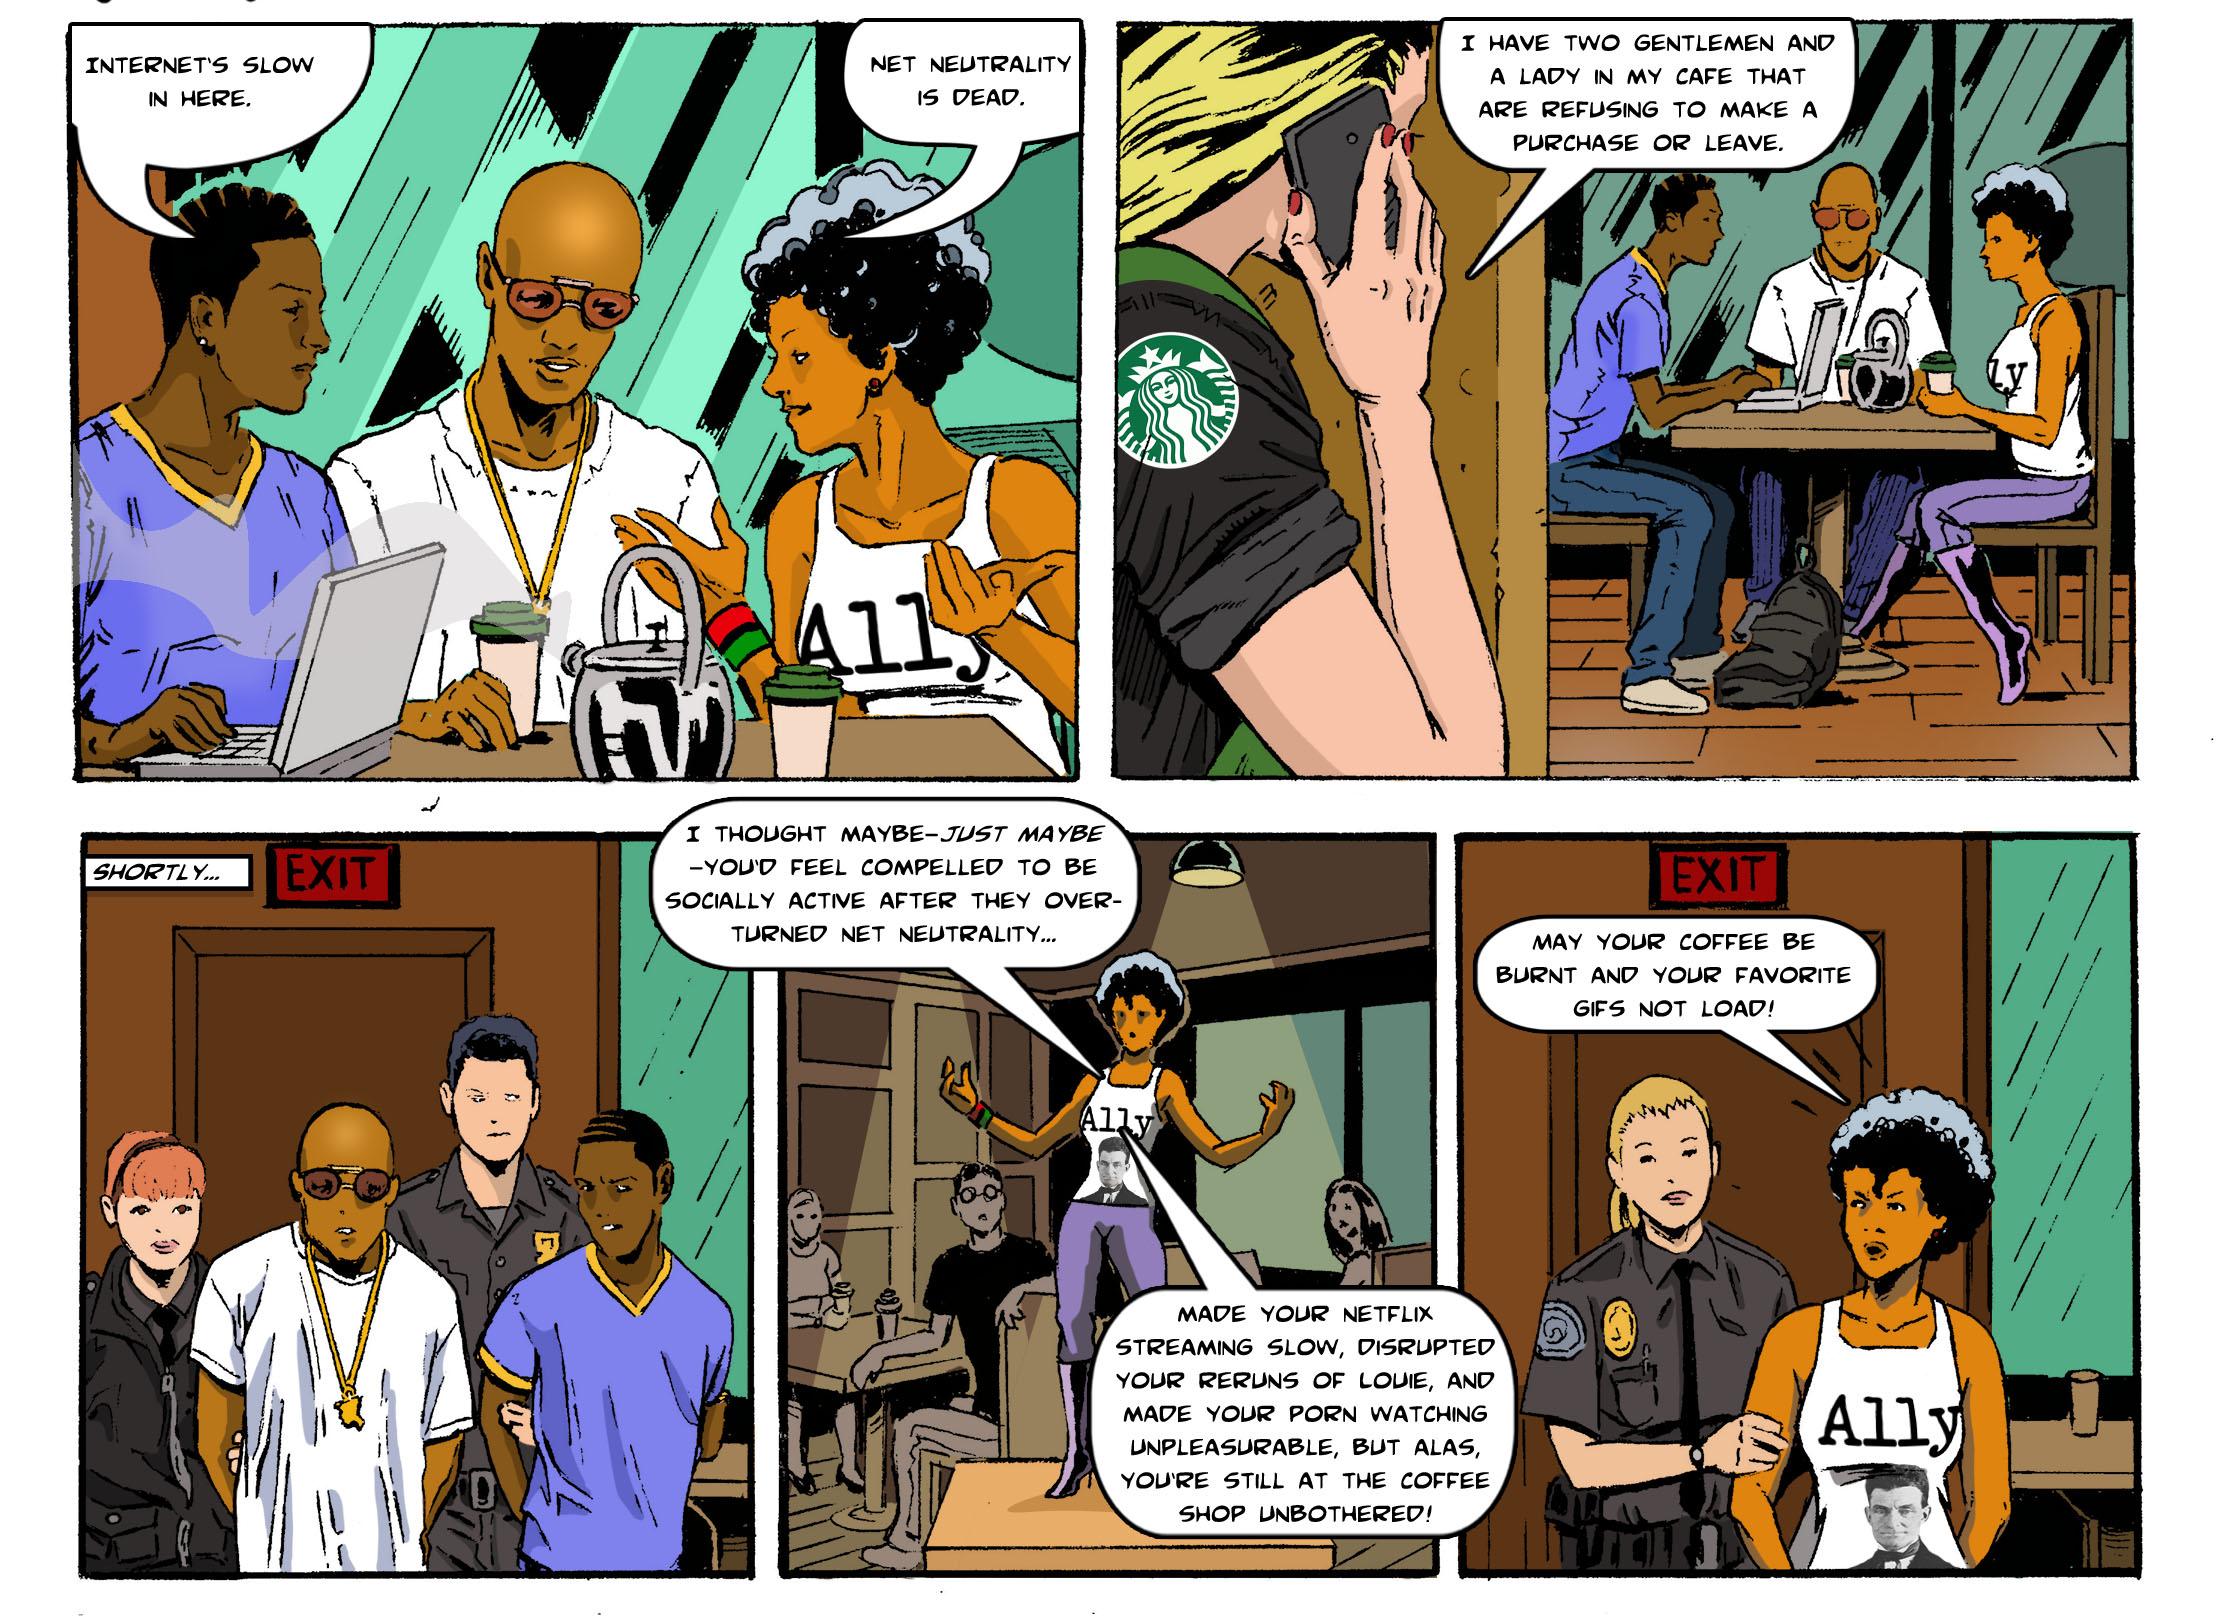 (H)af Comic Strip #75.jpg